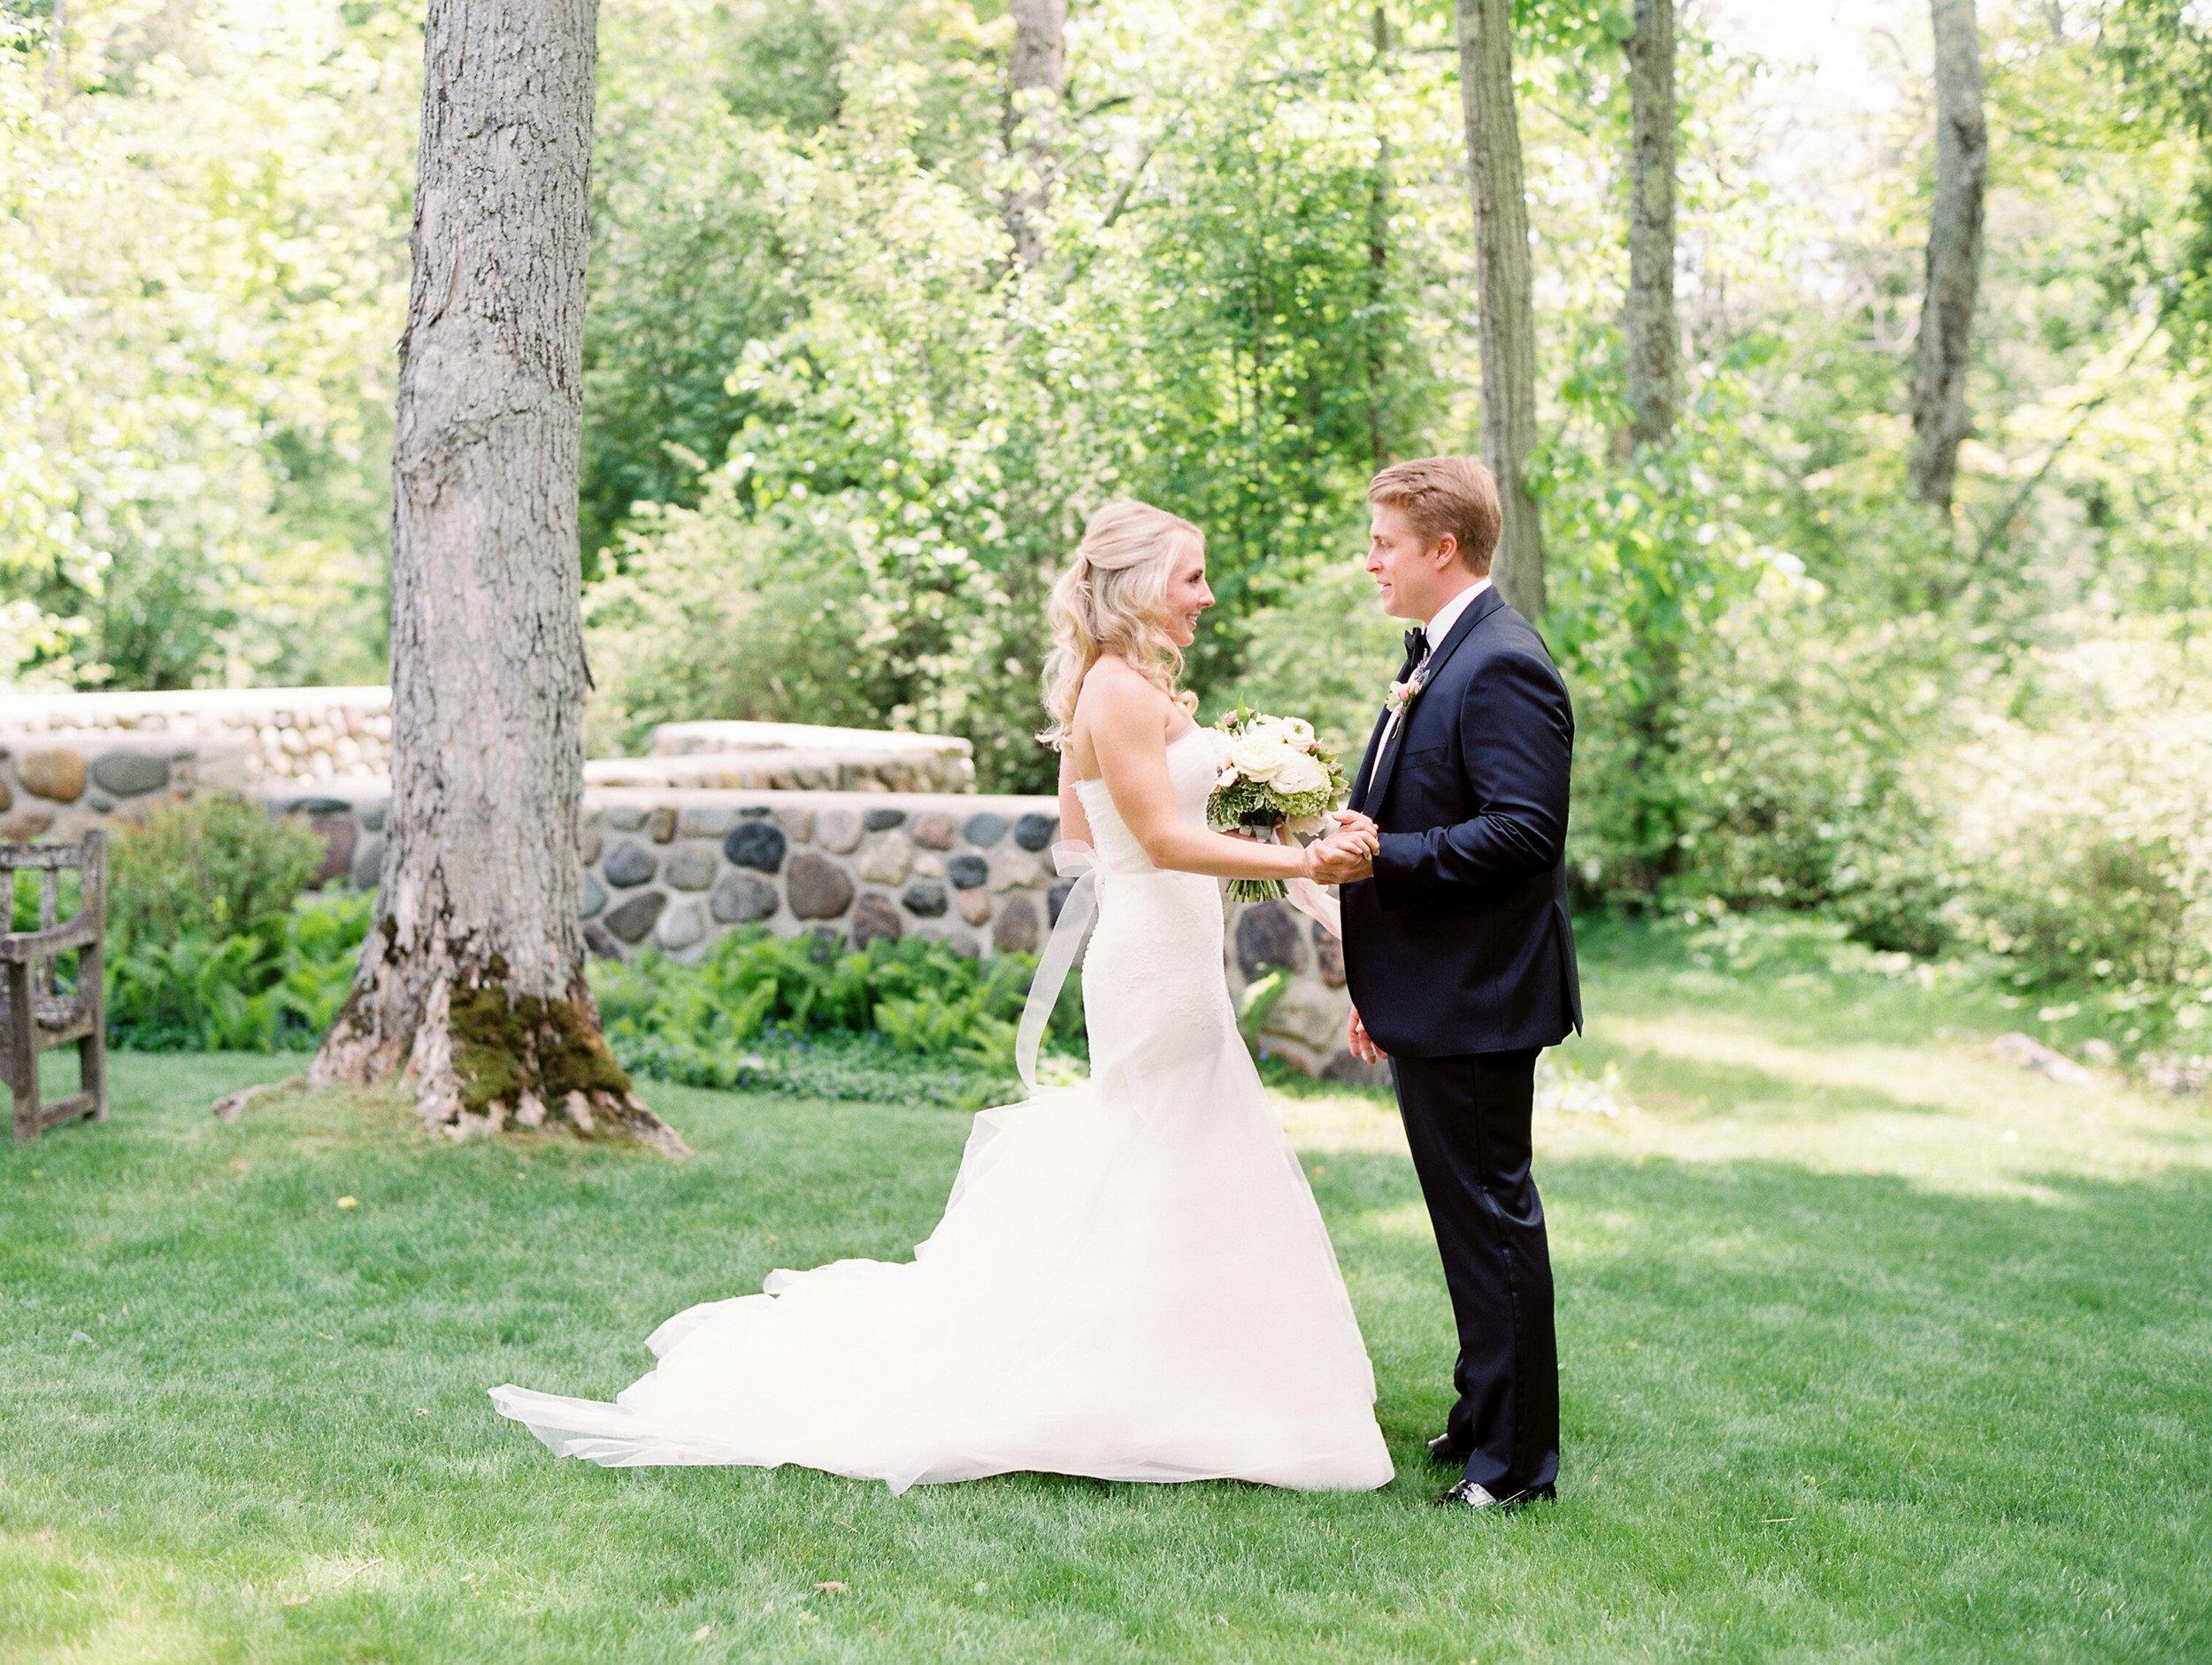 Coffman+Wedding+First+Look-23.jpg